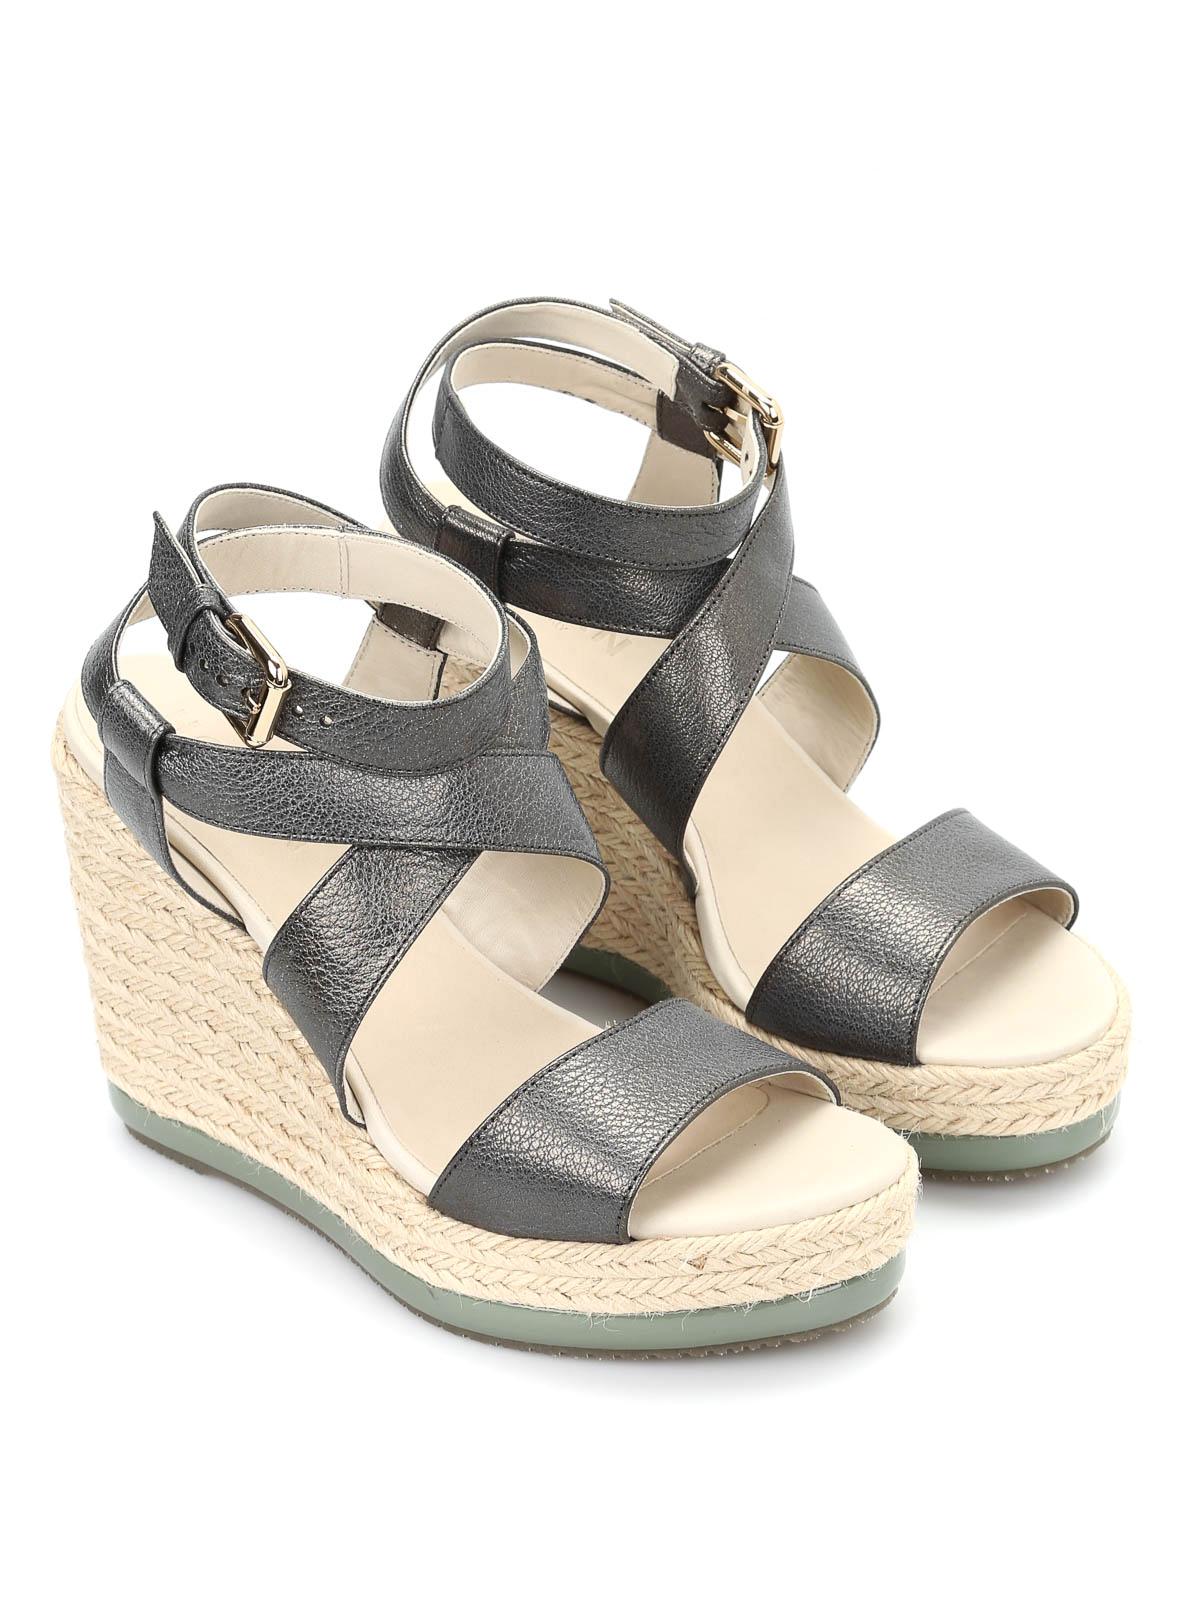 Hogan - H286 Zeppa Yuta sandals - sandals - HXW2860U070BT8V604 ...